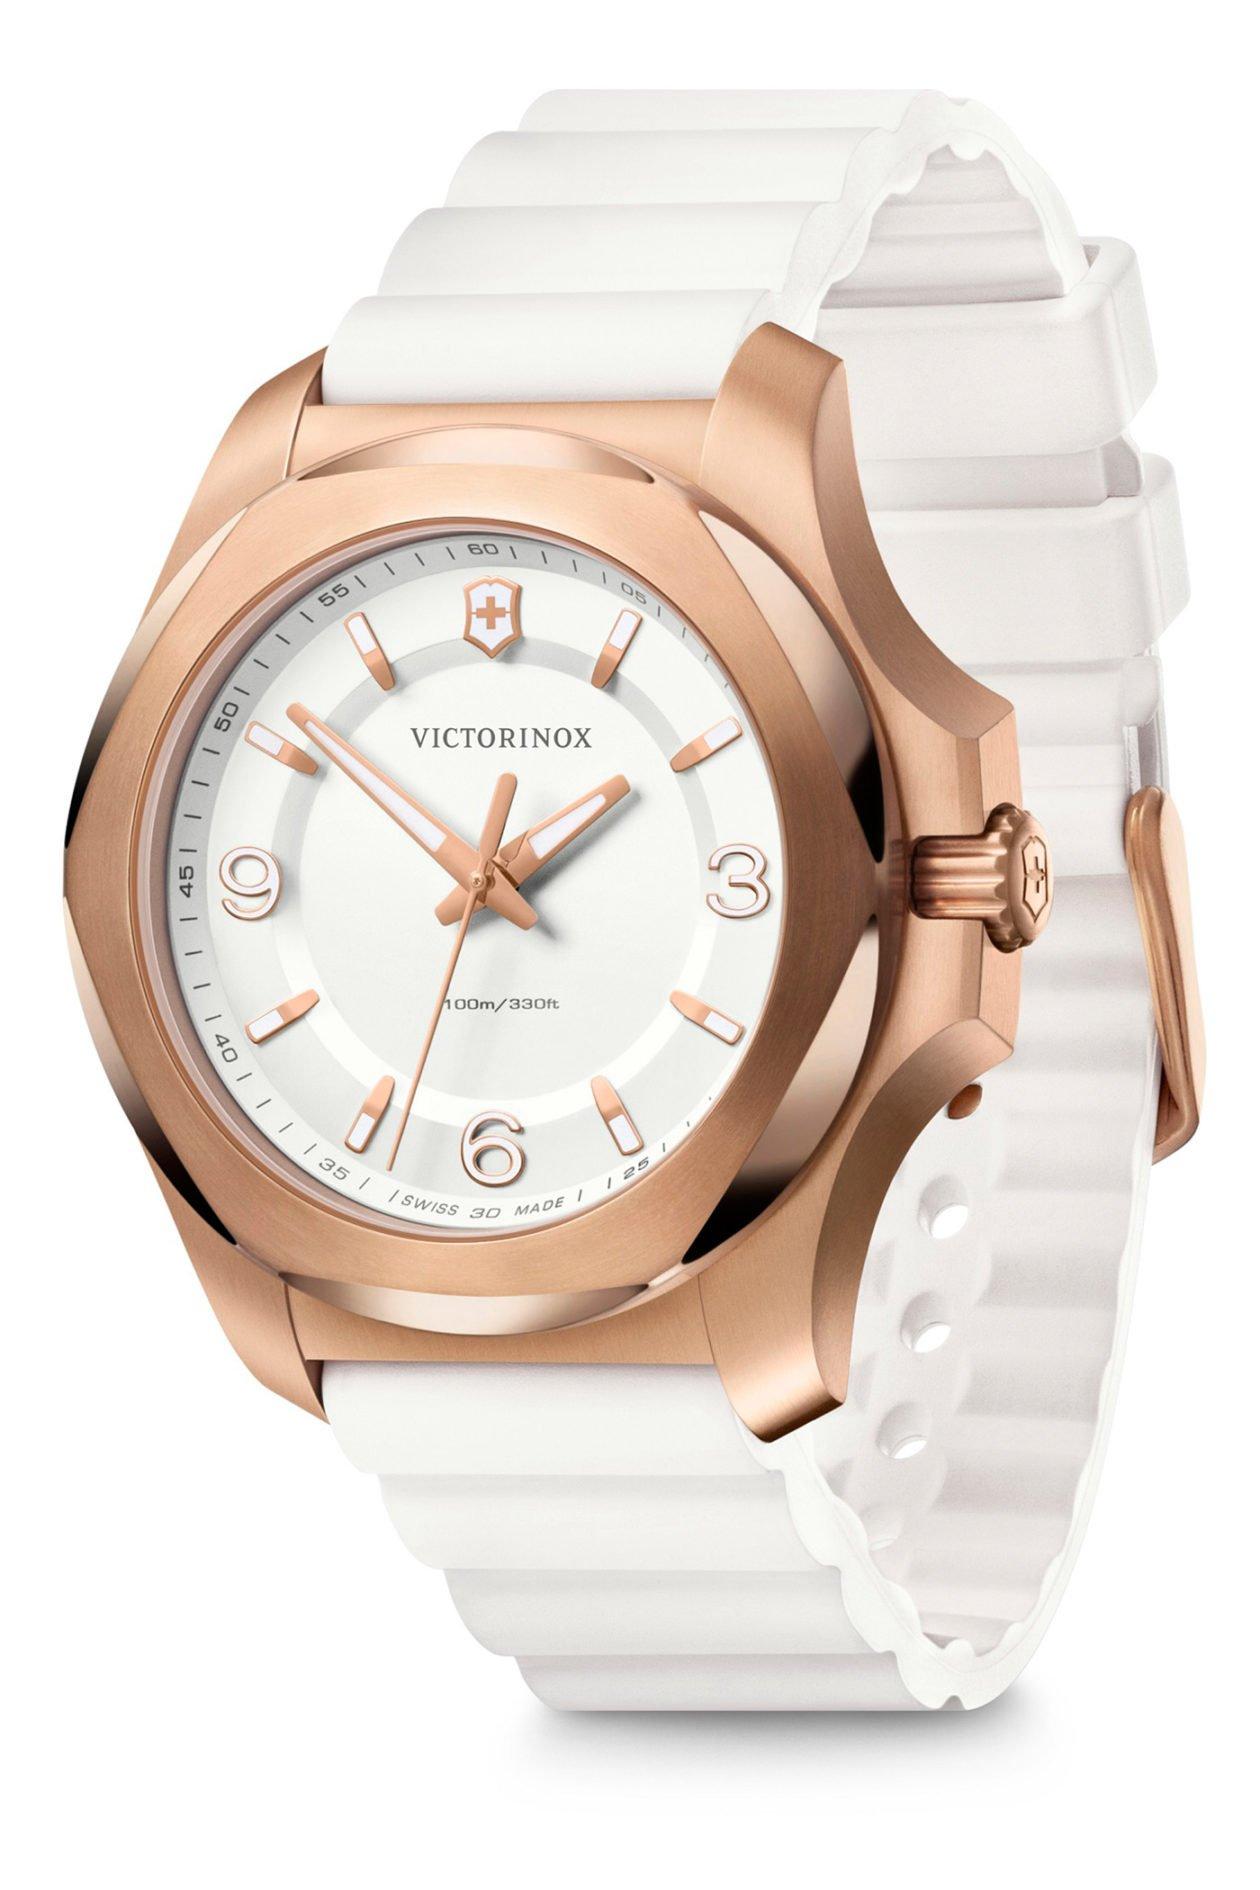 Victorinox I.N.O.X. V